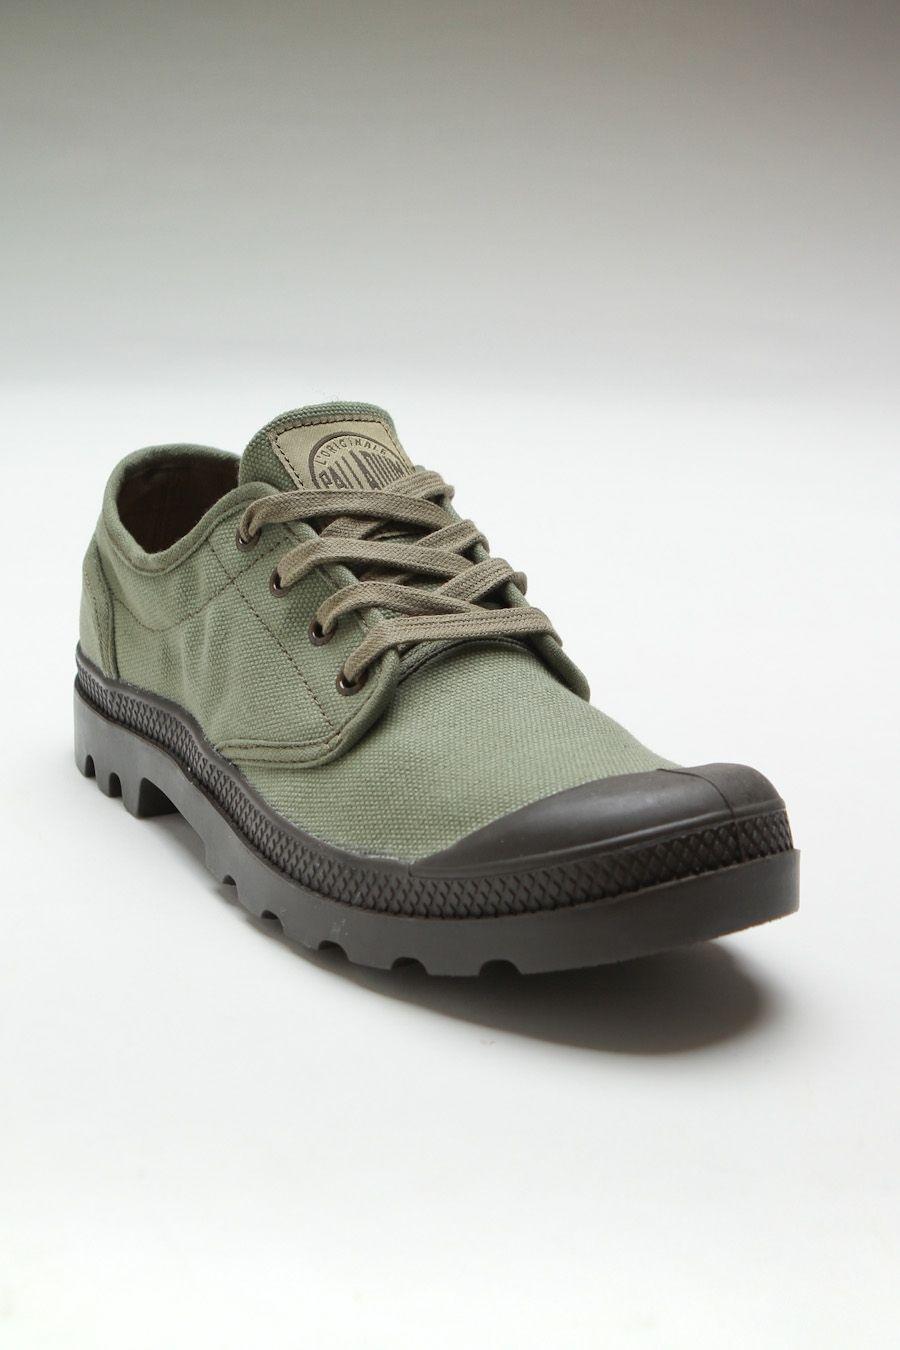 on sale 8b96d 8fb54 PAMPA OXFORD OTAN Zapatos Casuales, Zapatillas, Calzas, Caballero, Hombres,  Arquitectura,